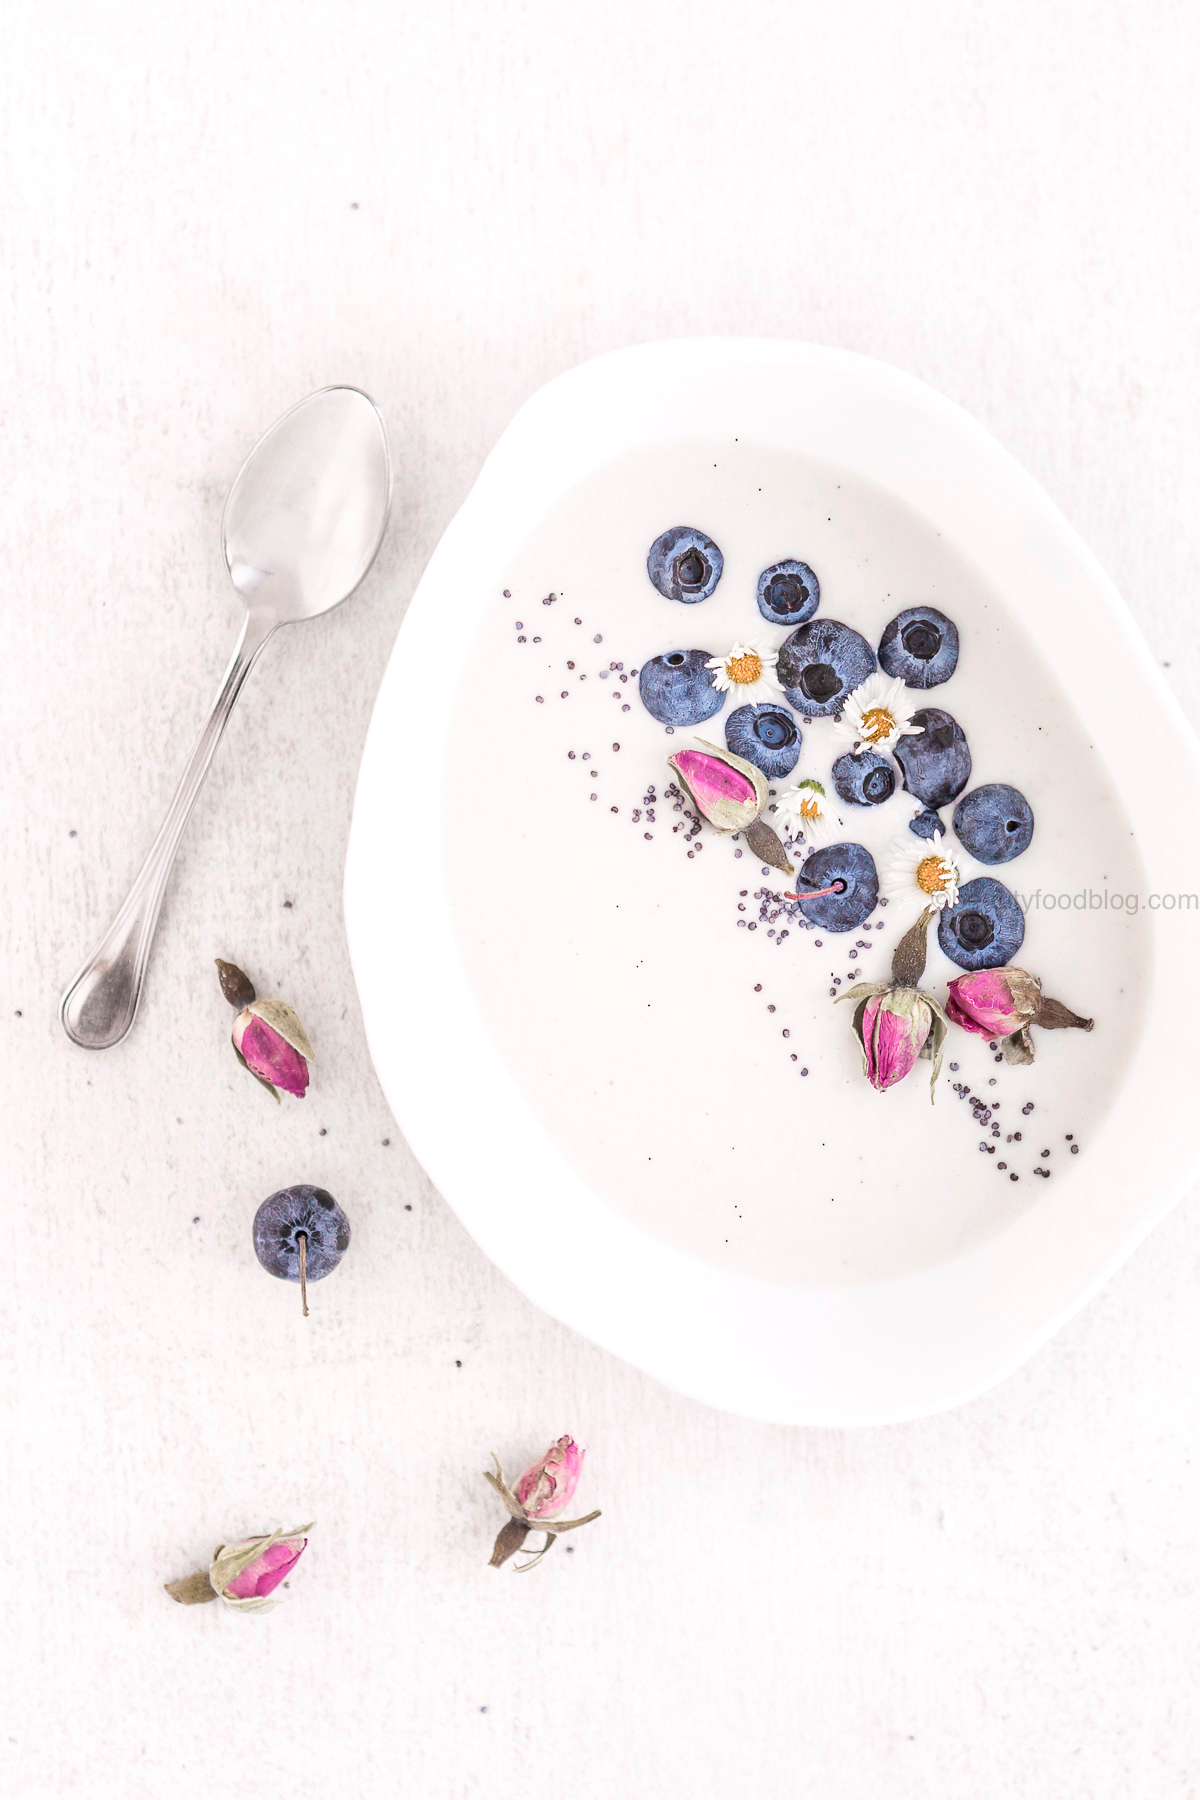 ricetta yogurt vegan fatto in casa raw agli anacardi o mandorle easy homemade #vegan #yogurt recipe beauty food blog